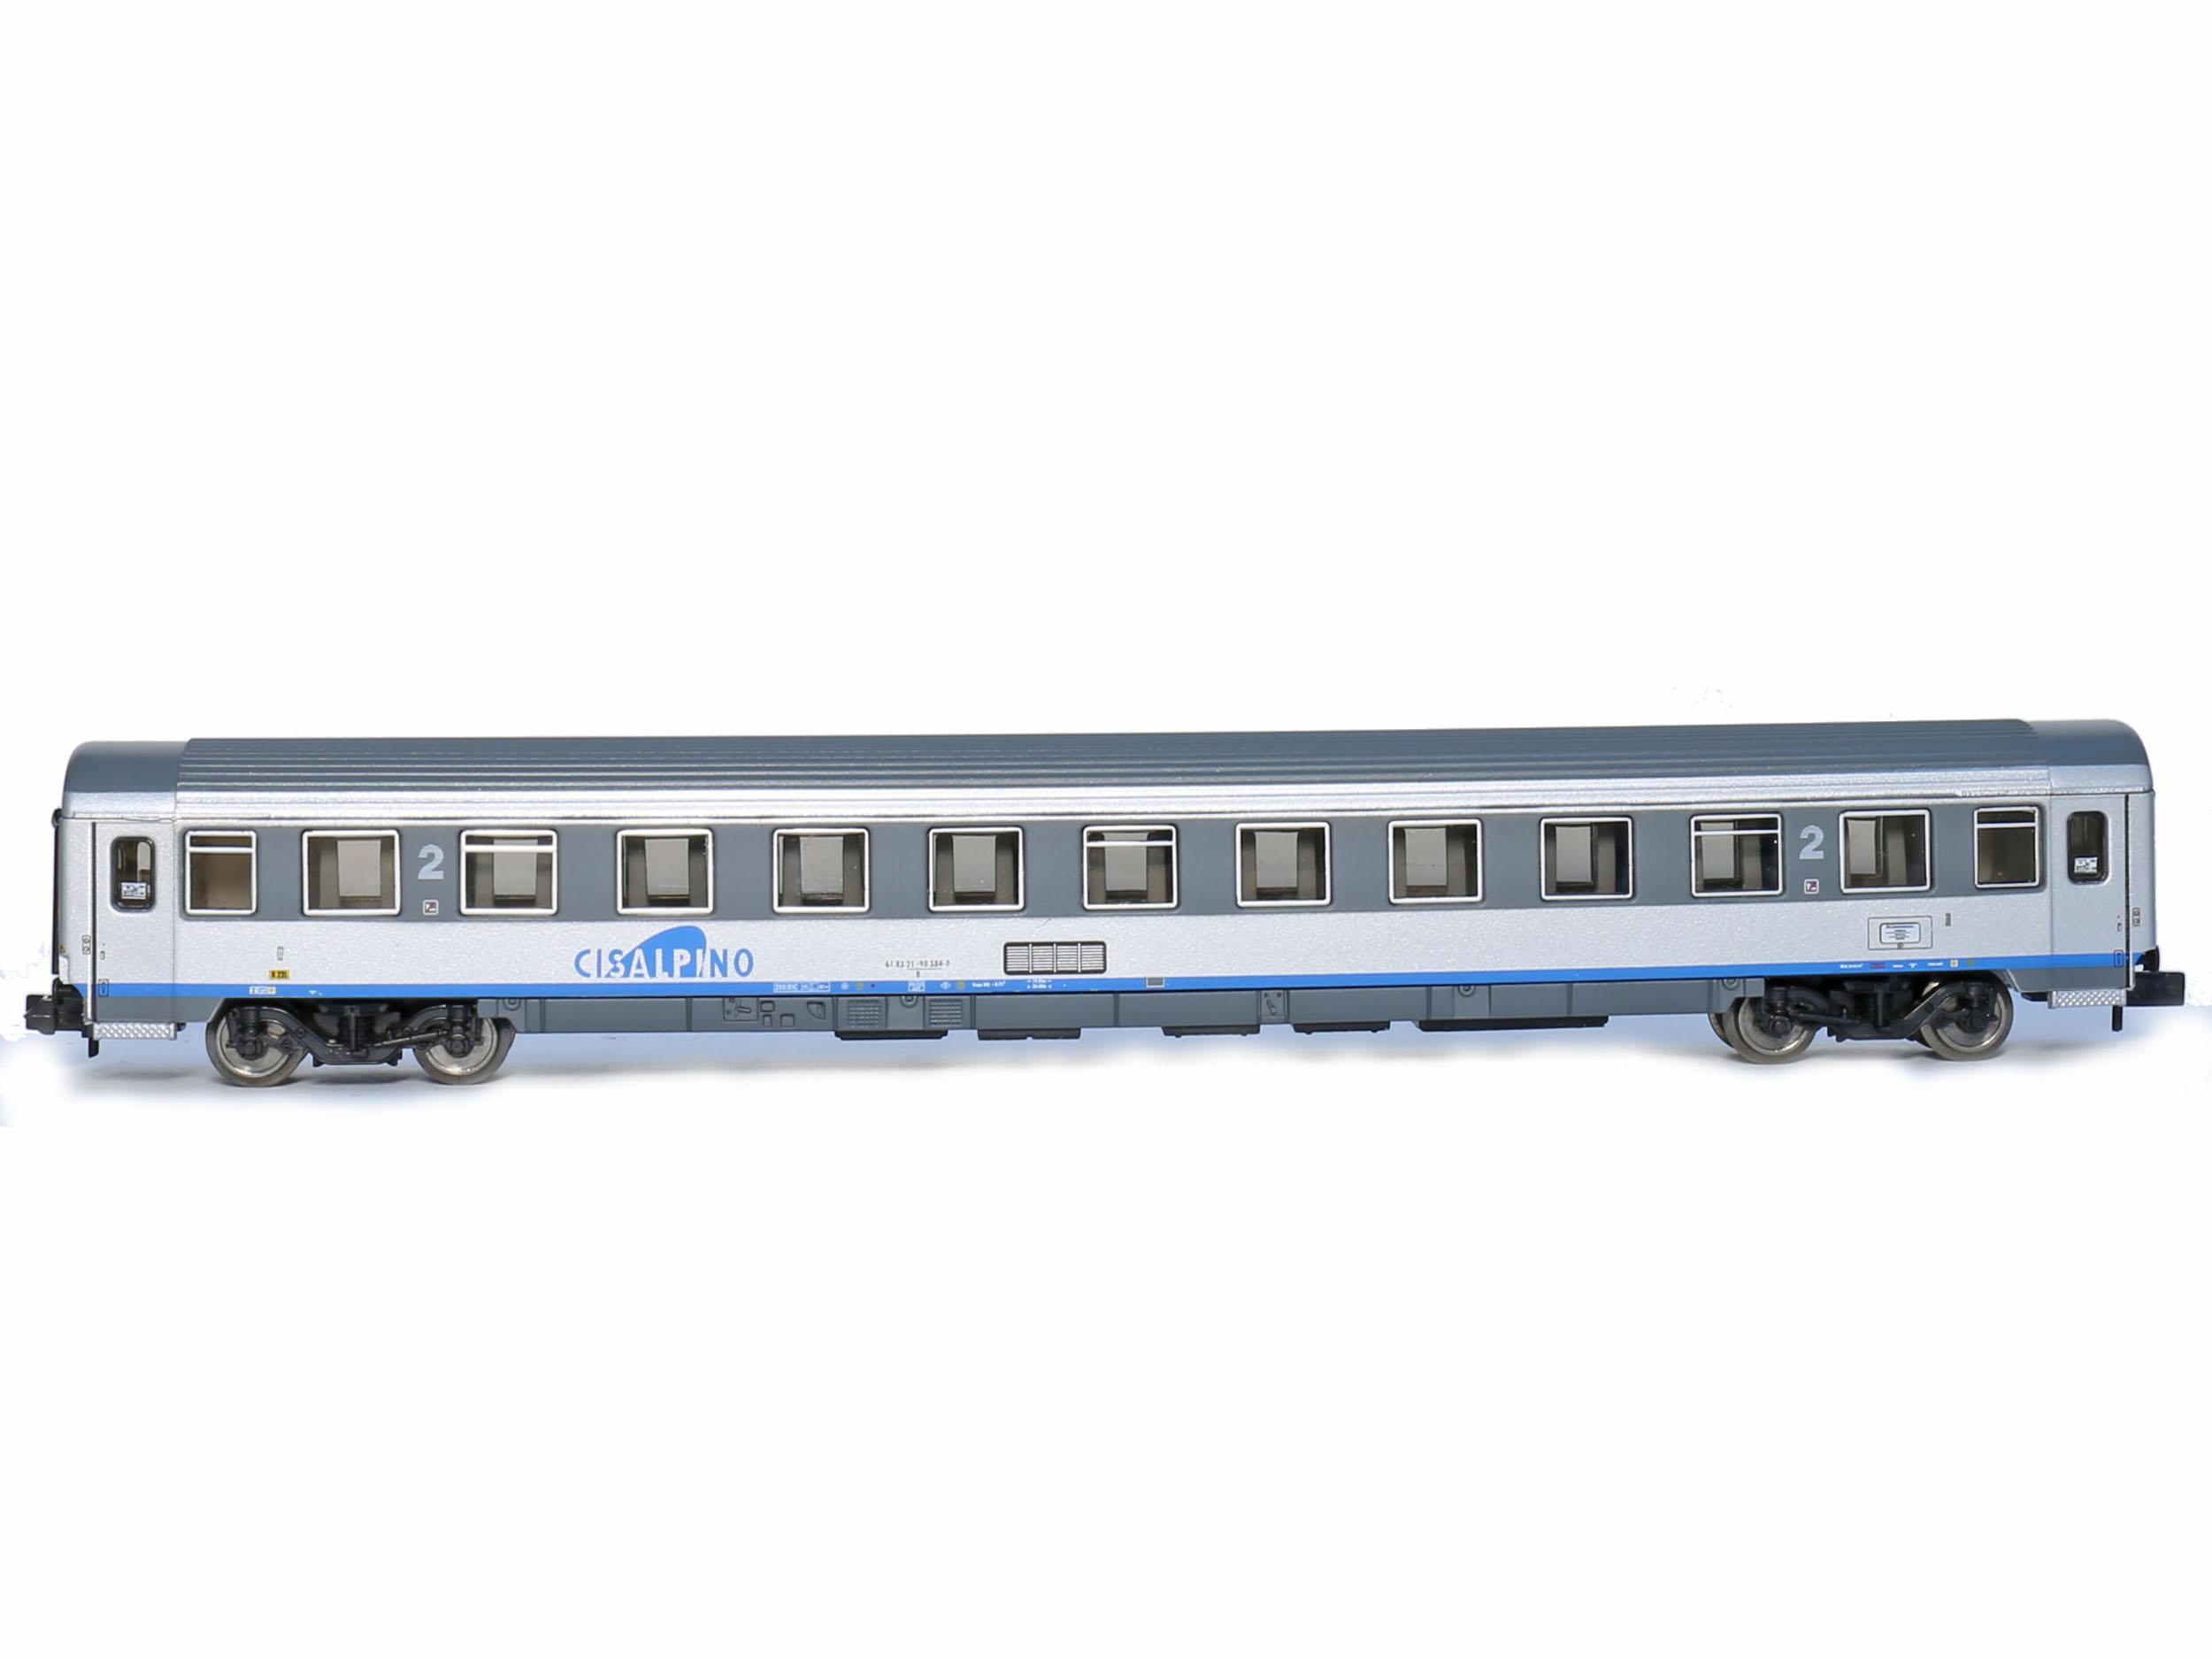 Arnold HN4267 Model Railway Rolling Stock